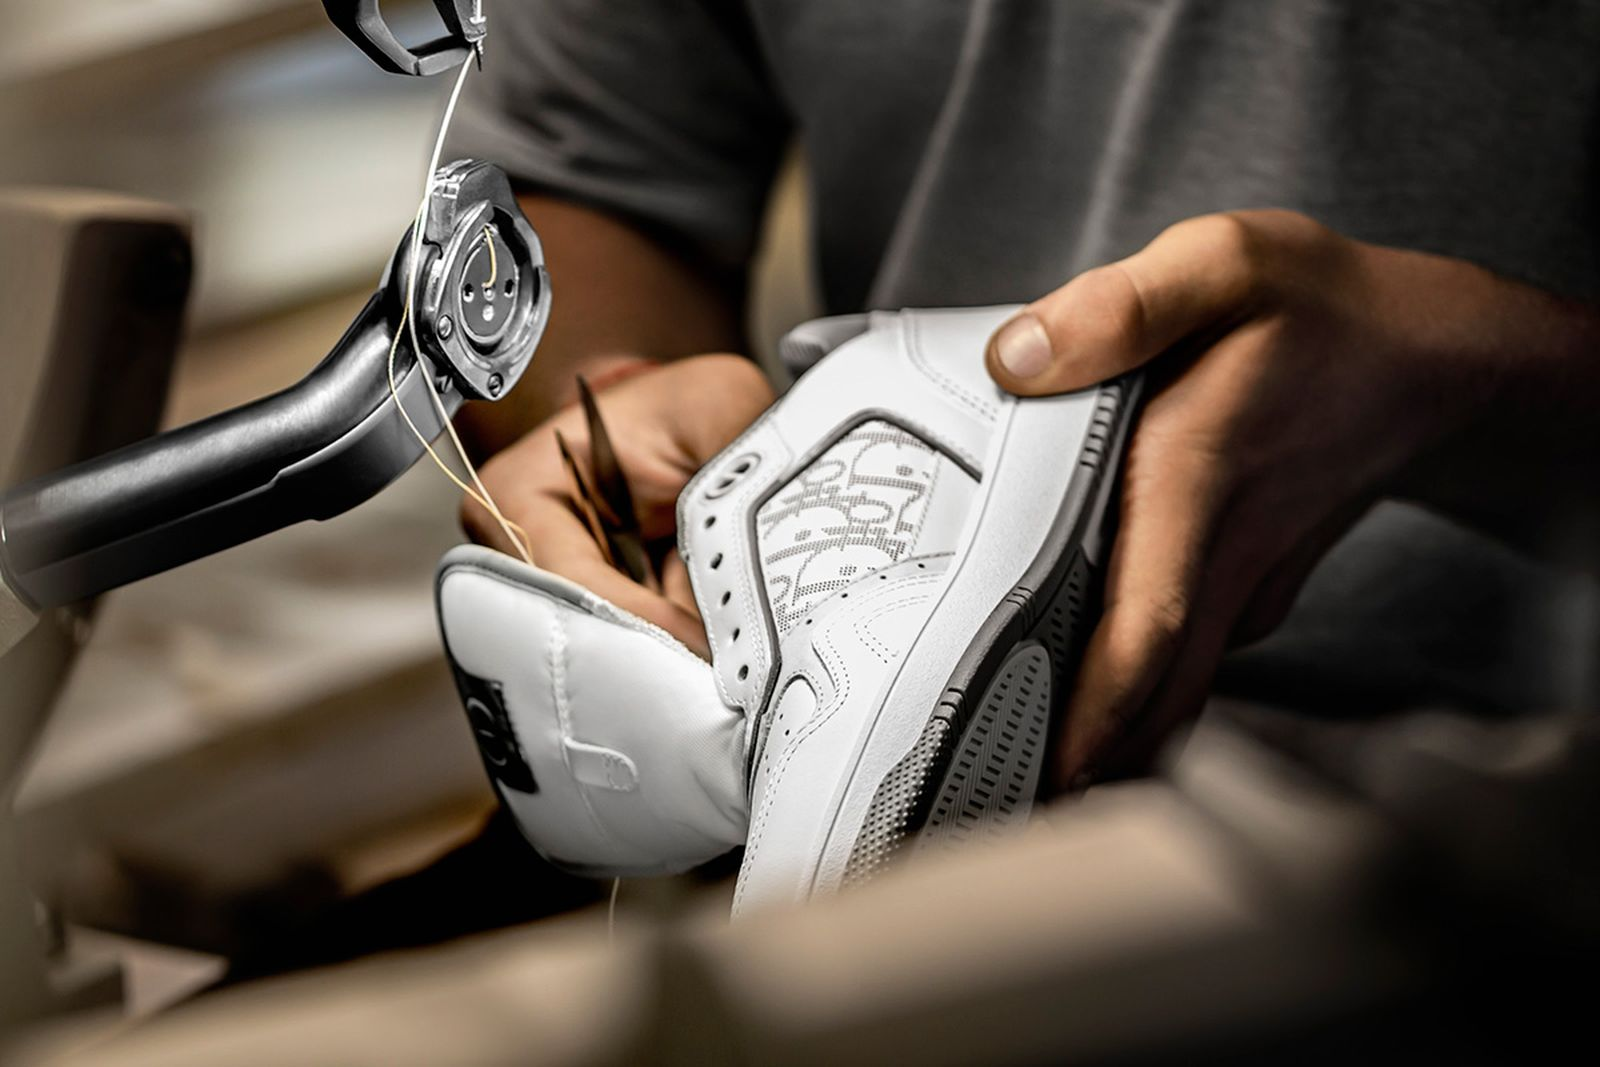 dior-b27-sneaker-release-date-price-new-03